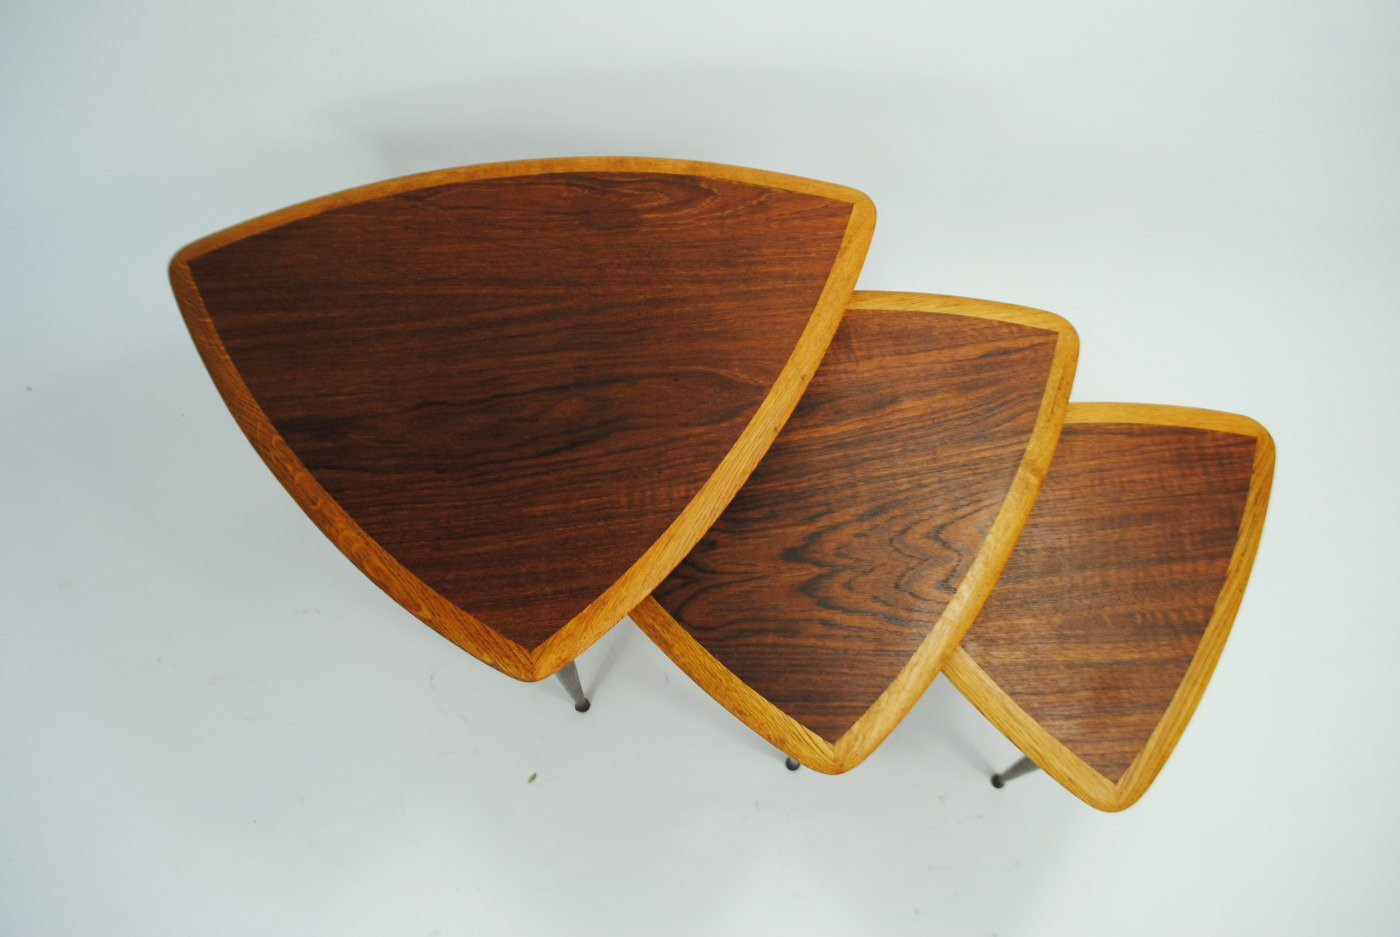 Danish Teak amp Oak Nesting Tables 1950s For Sale At Pamono